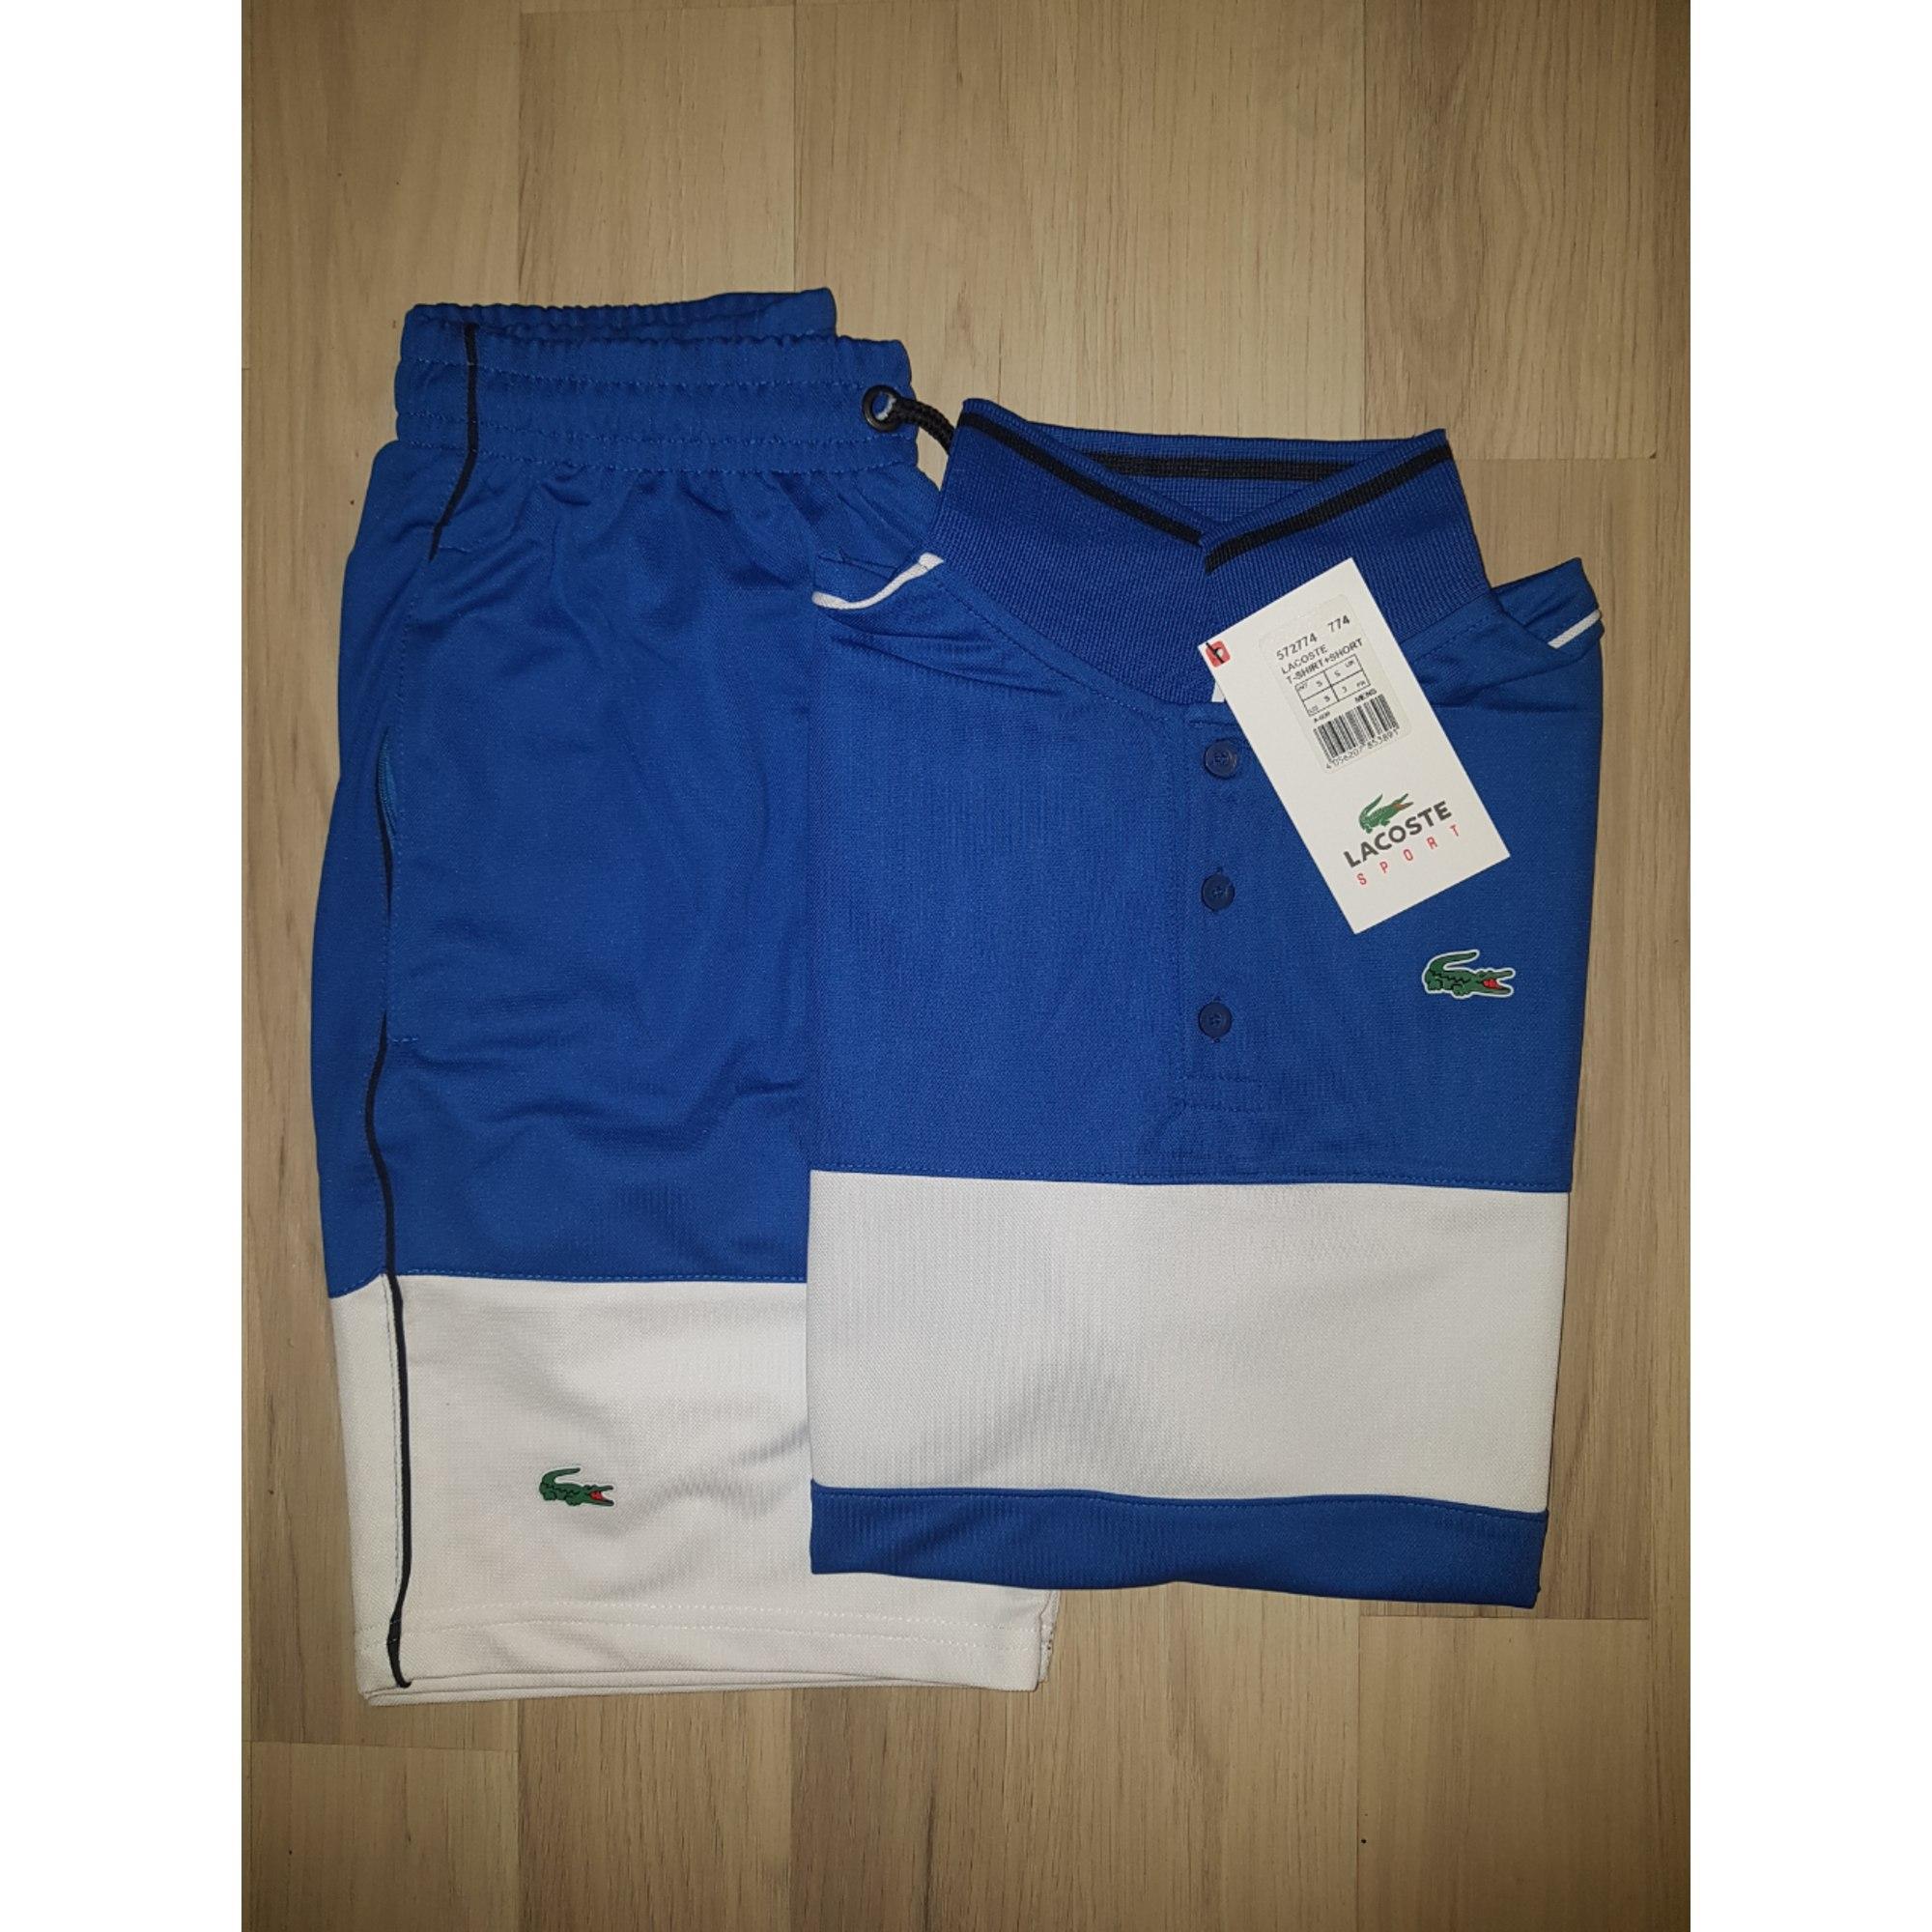 4005639328be Ensemble jogging LACOSTE Bleu, bleu marine, bleu turquoise